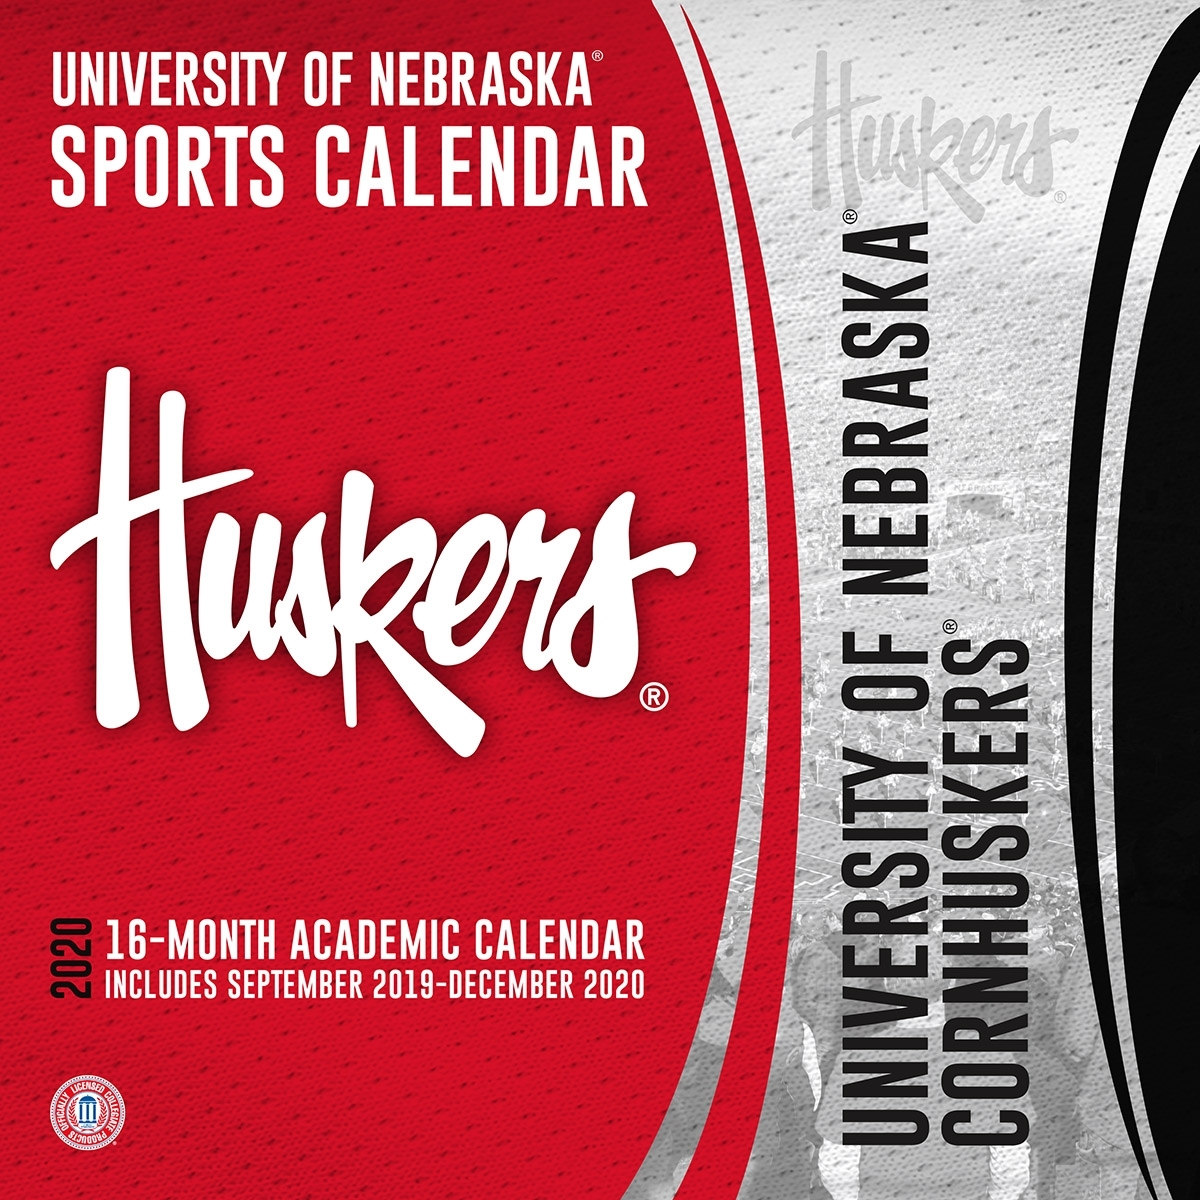 Nebraska Cornhuskers 2020 Wall Calendar - Buy At Khc Sports